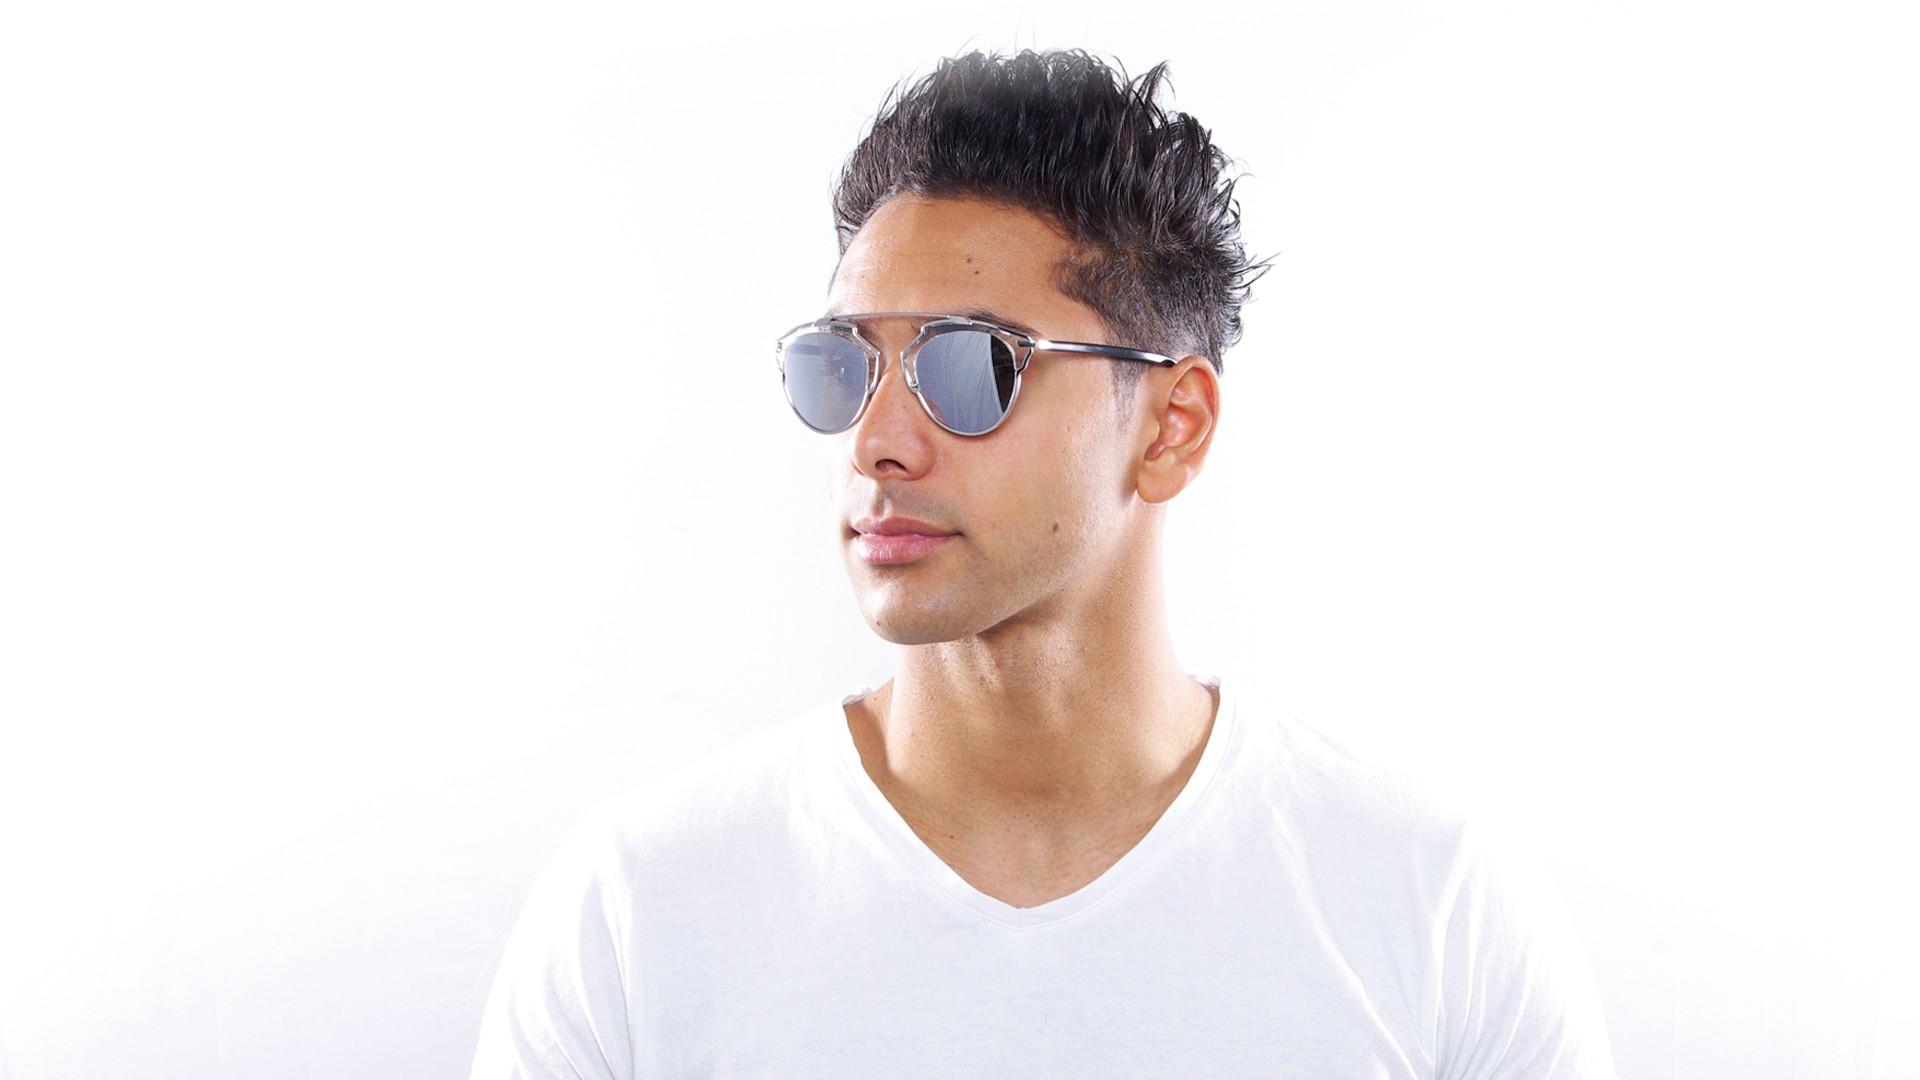 fbb268c3d04b4 Sunglasses Dior SoReal Silver APPDC 48-22 Medium Flash